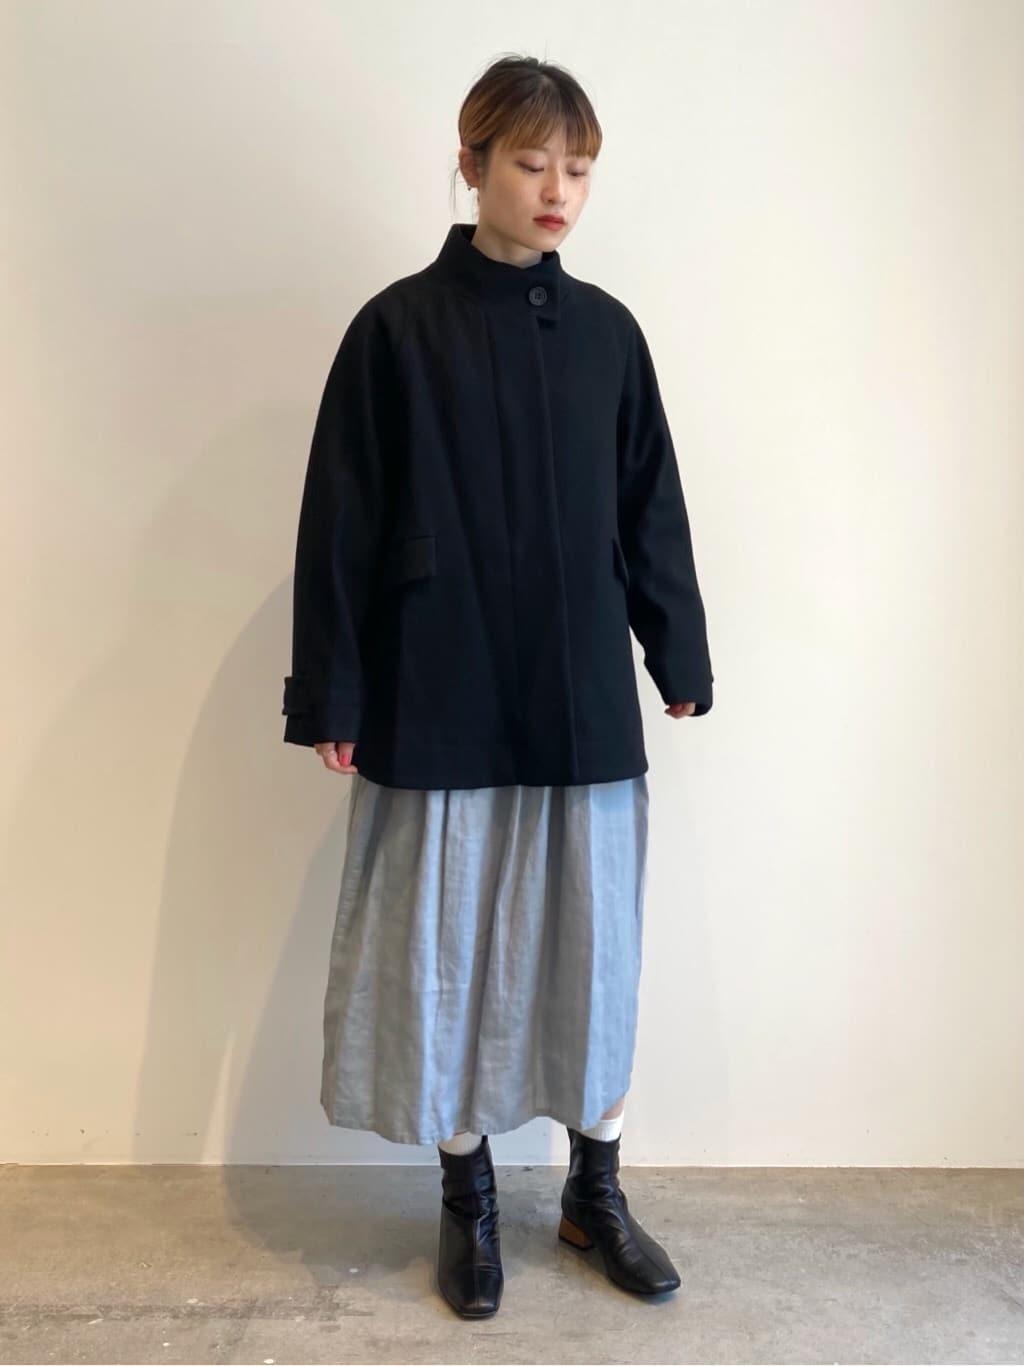 - bulle de savon FLAT AMB 名古屋栄路面 身長:162cm 2021.09.25